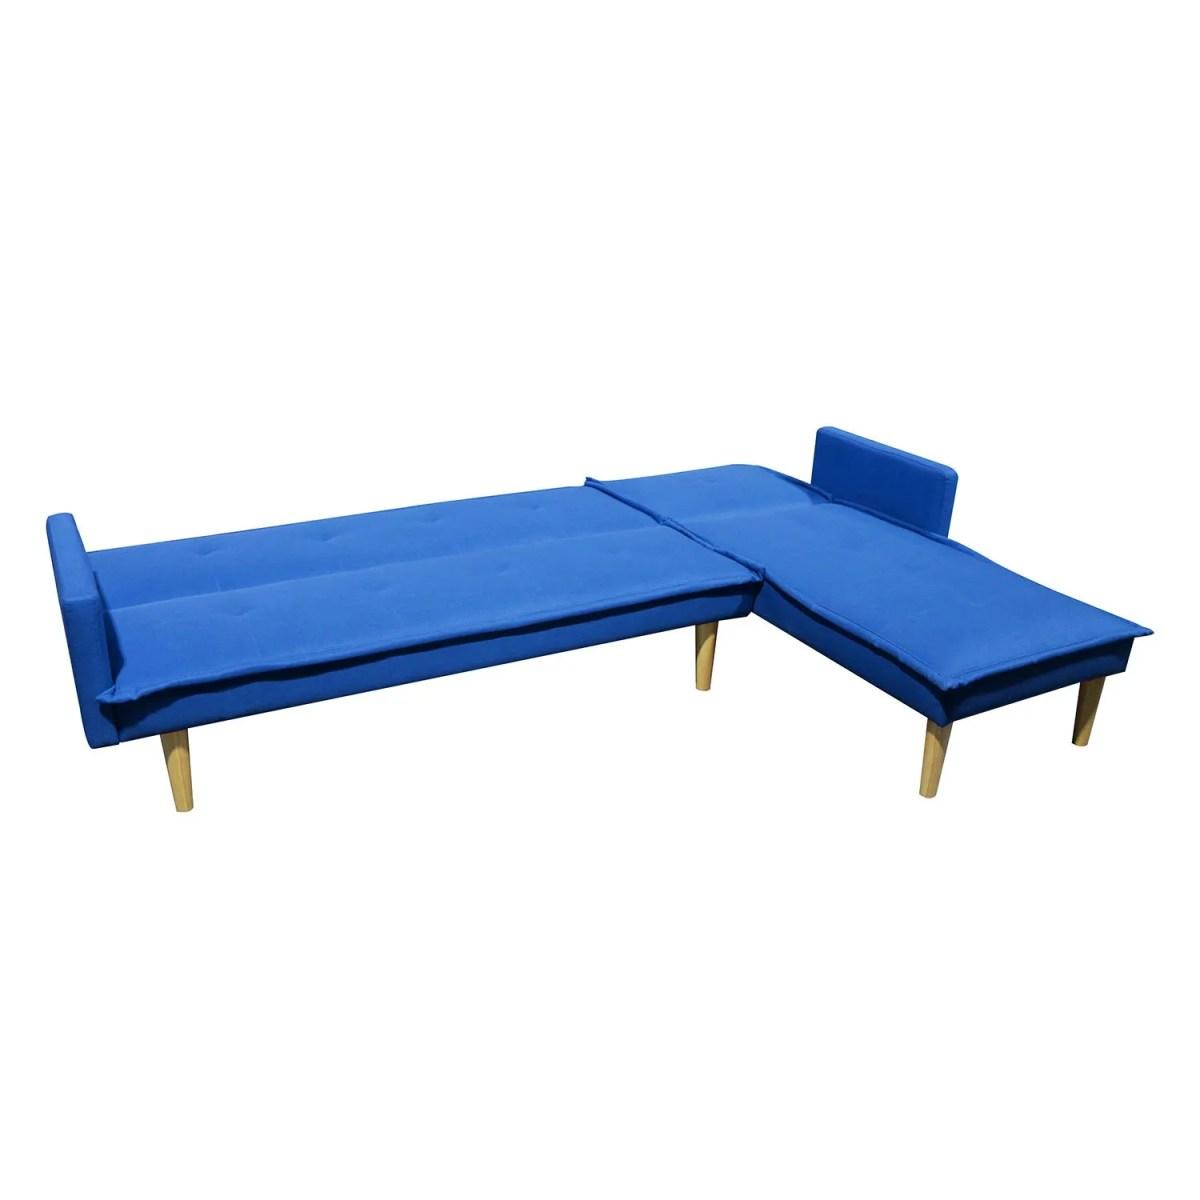 sala esquinada sofá cama independencia azul 6